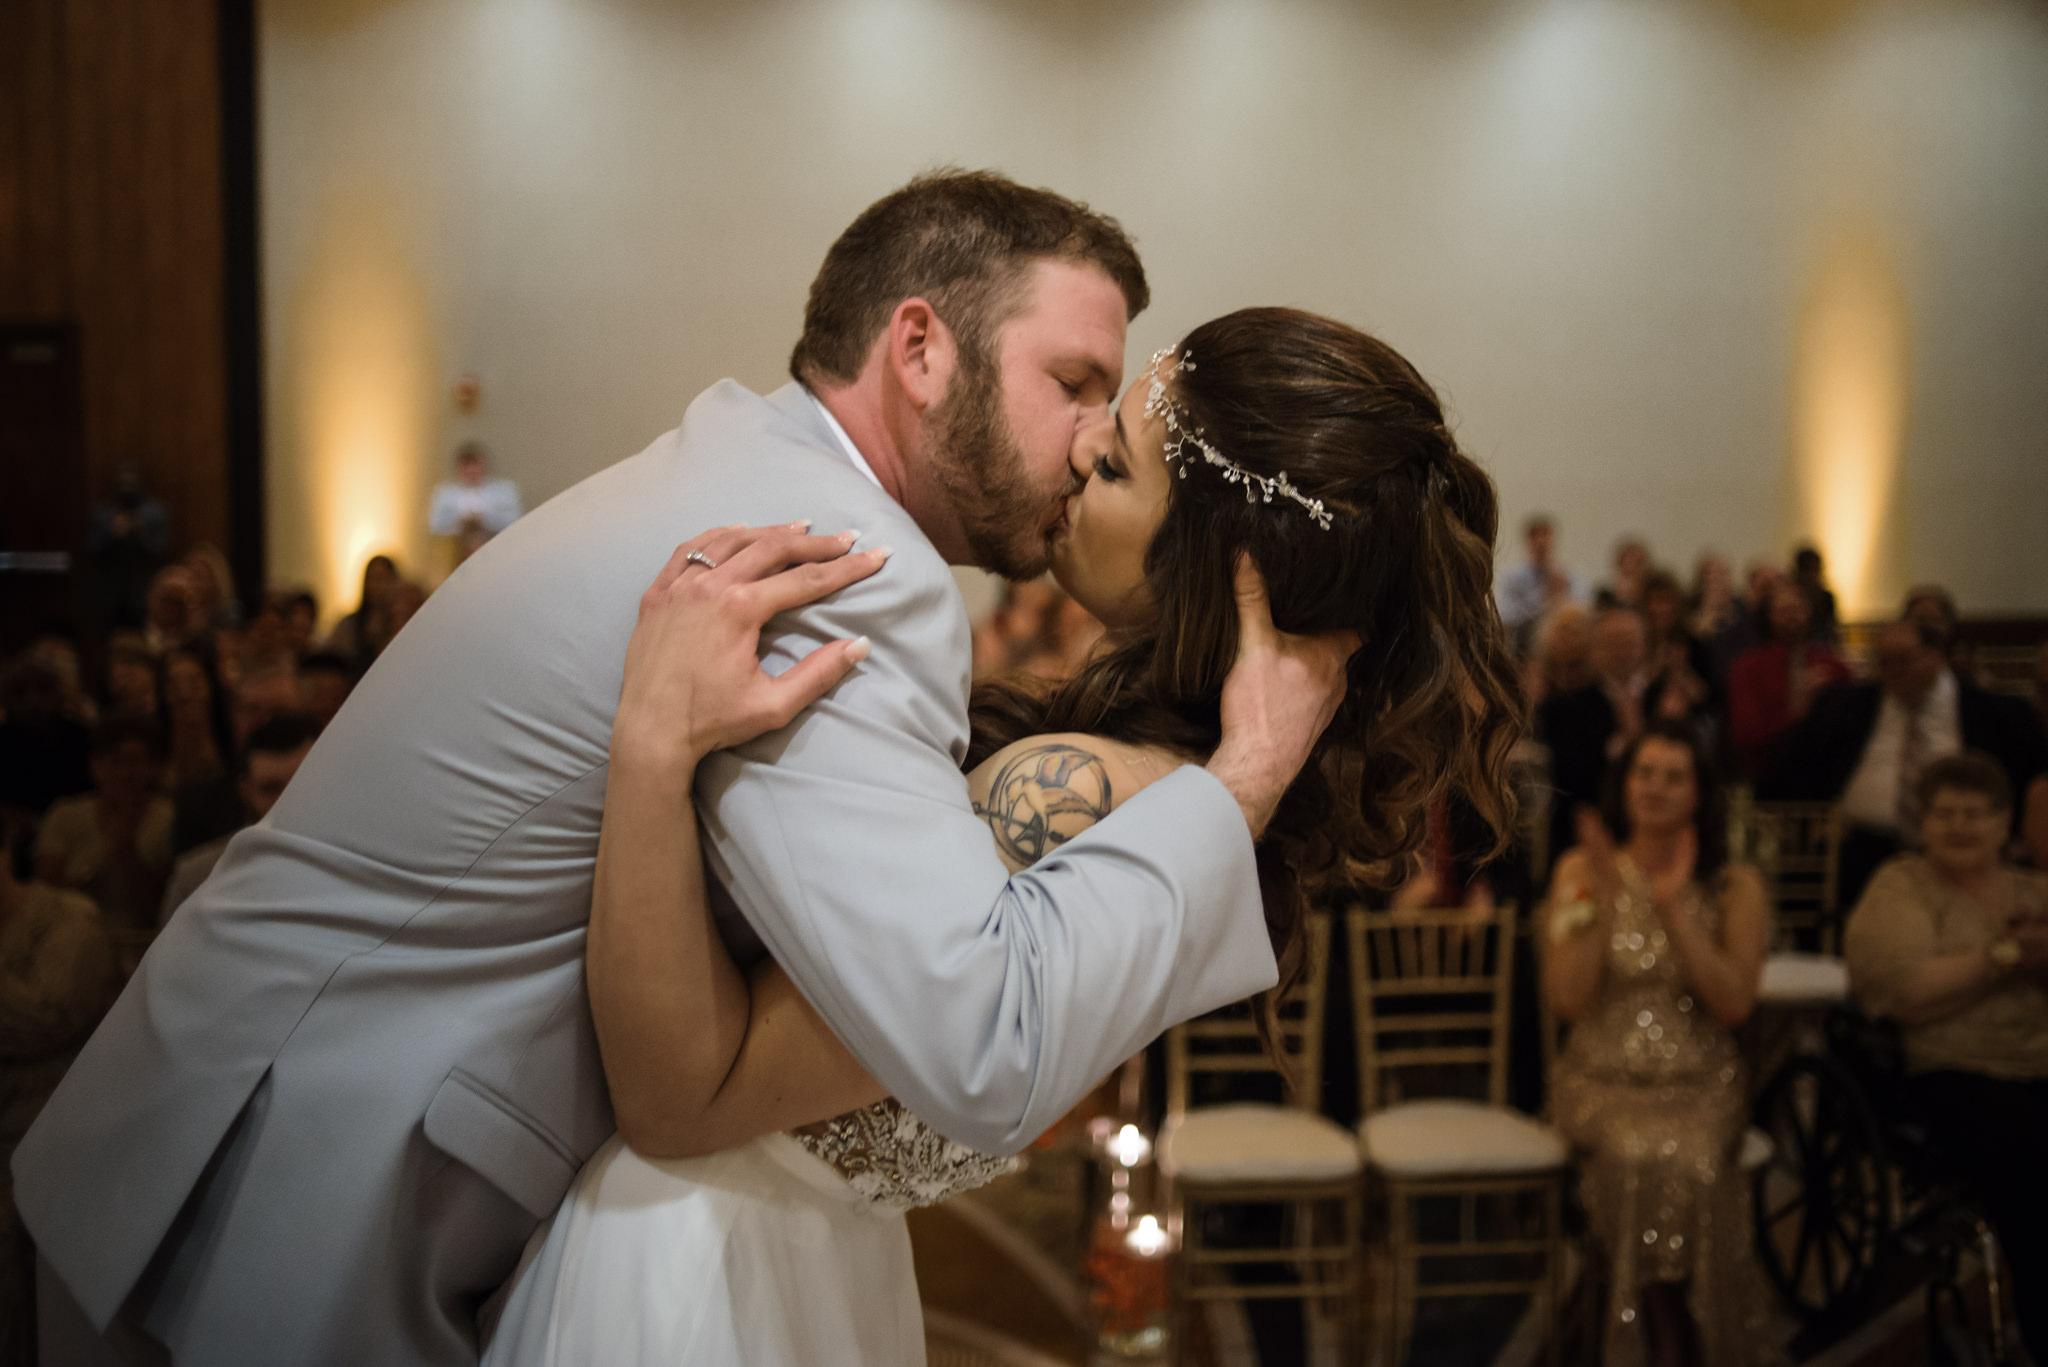 HILTON-OMAHA-WEDDING-PHOTOGRAPHER-JM-STUDIOS-OMAHA-LIV-BRICE-028.jpg